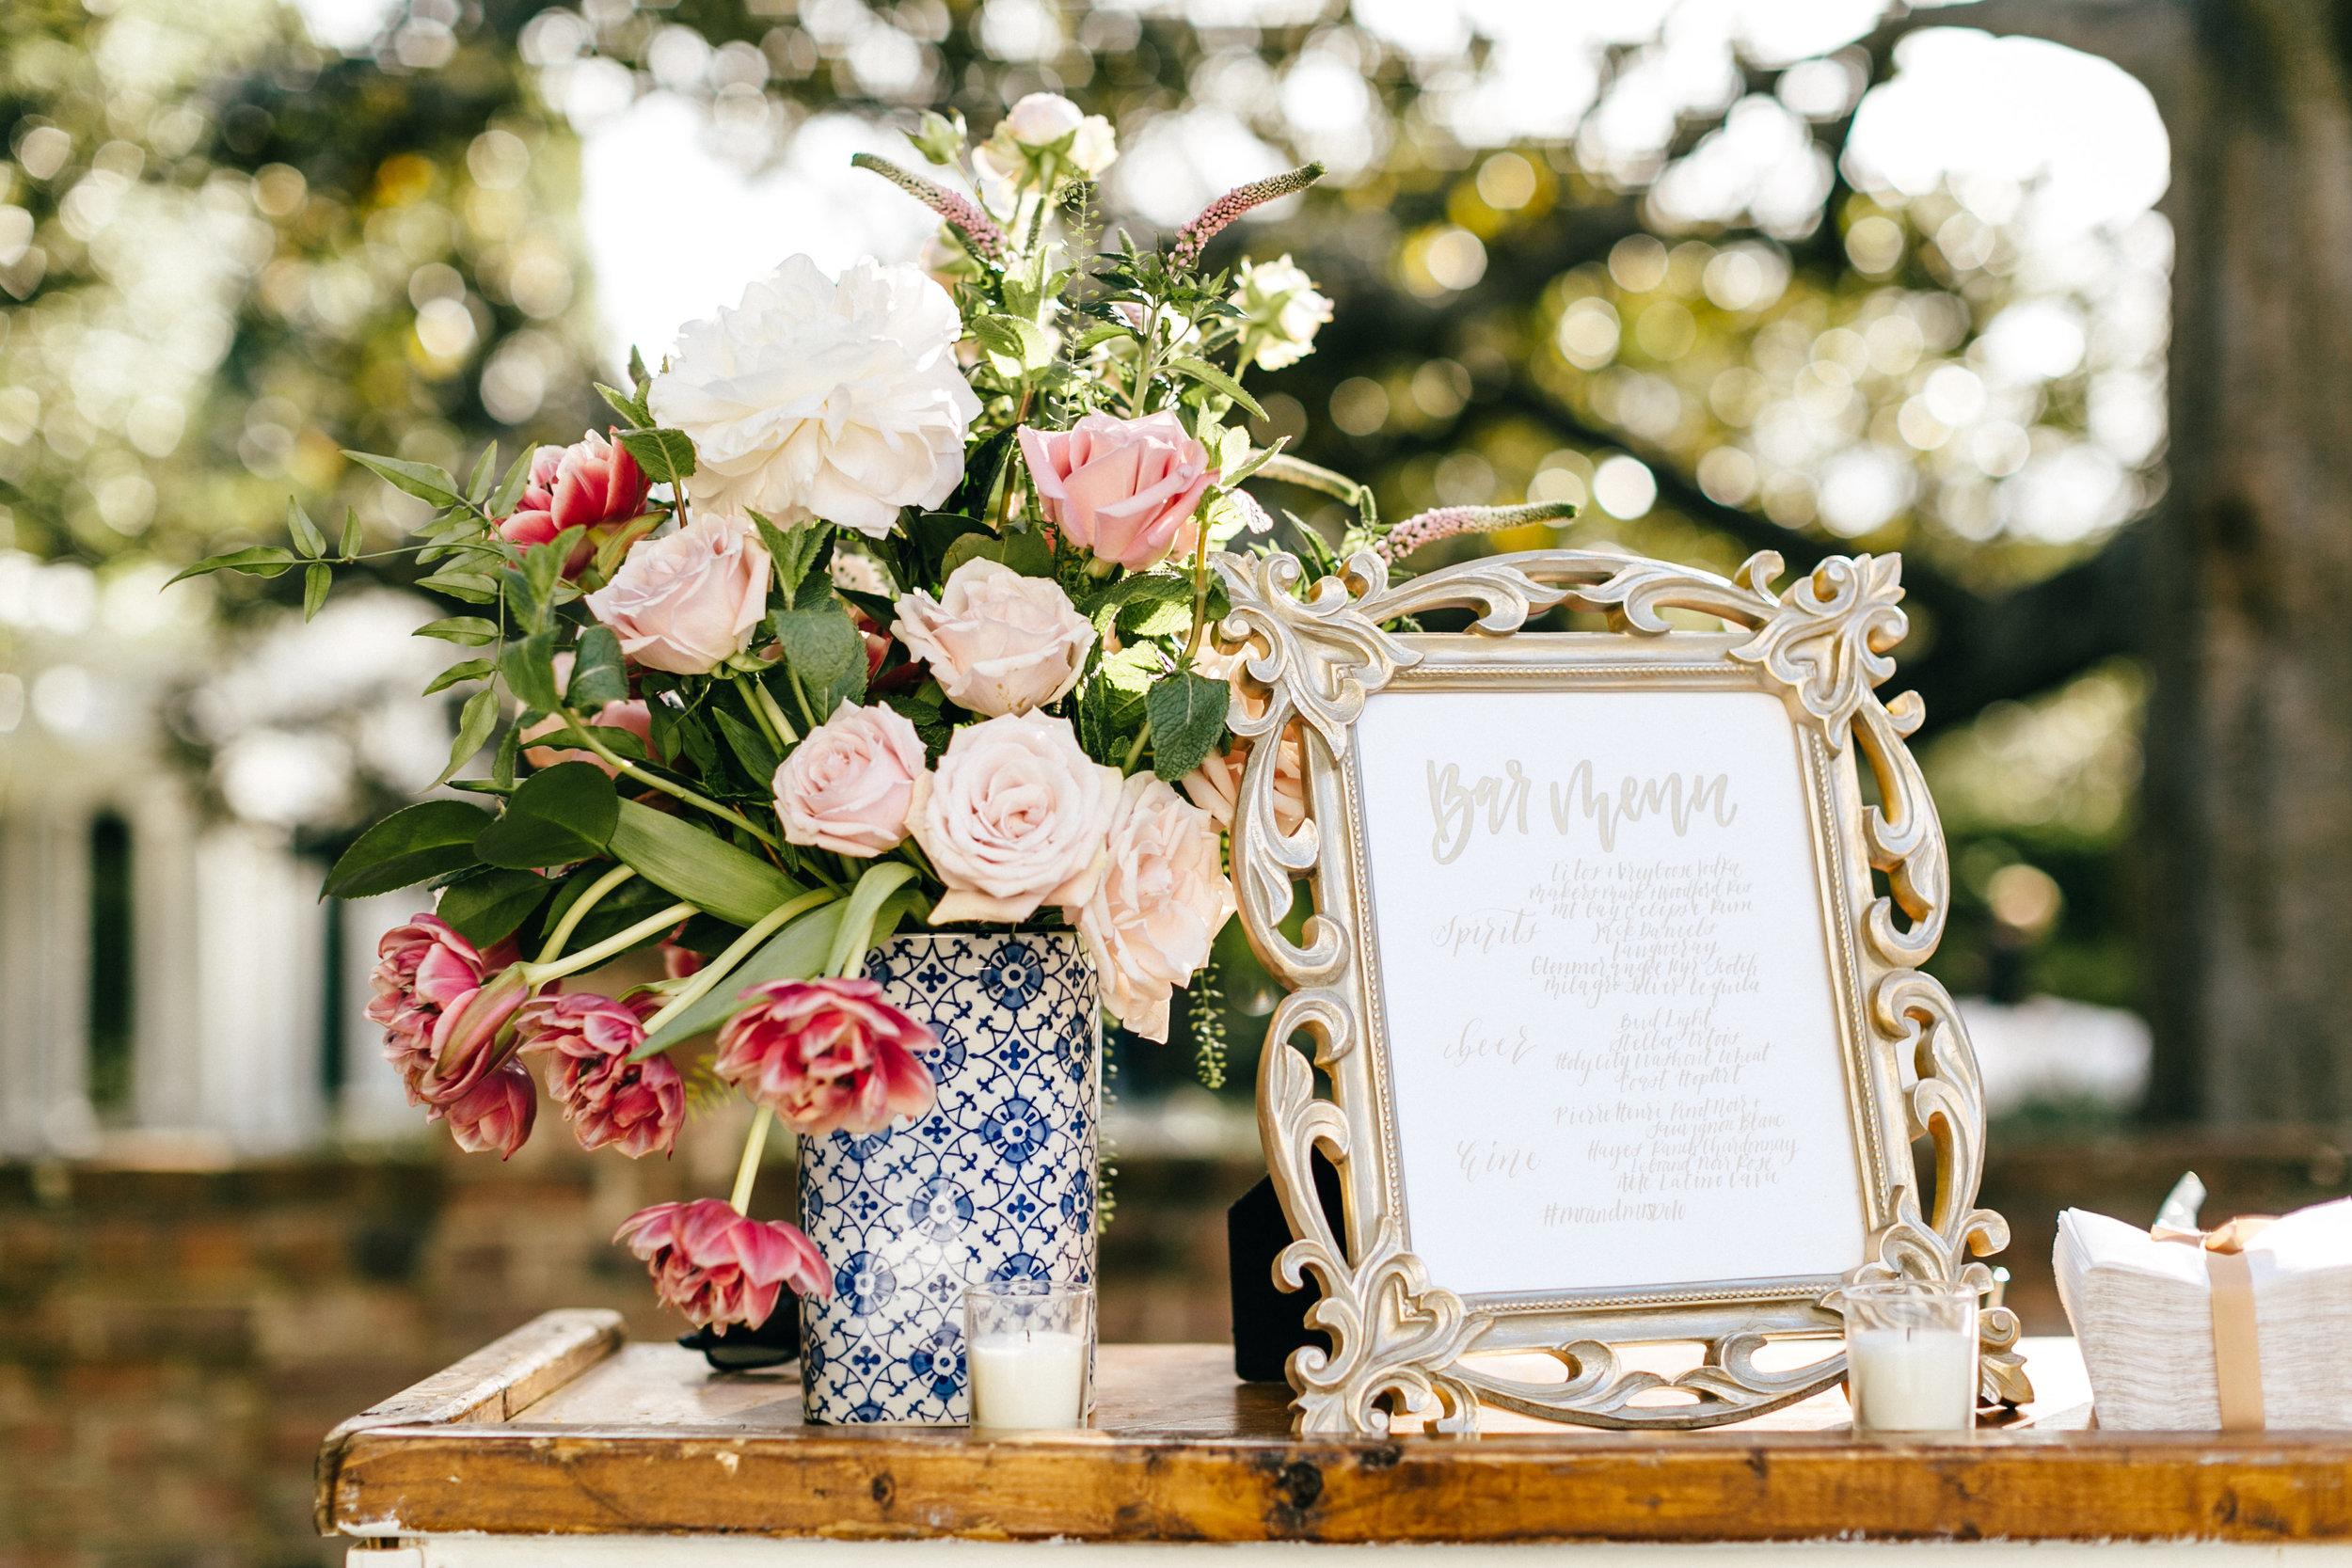 doloughty-wedding-737.jpg